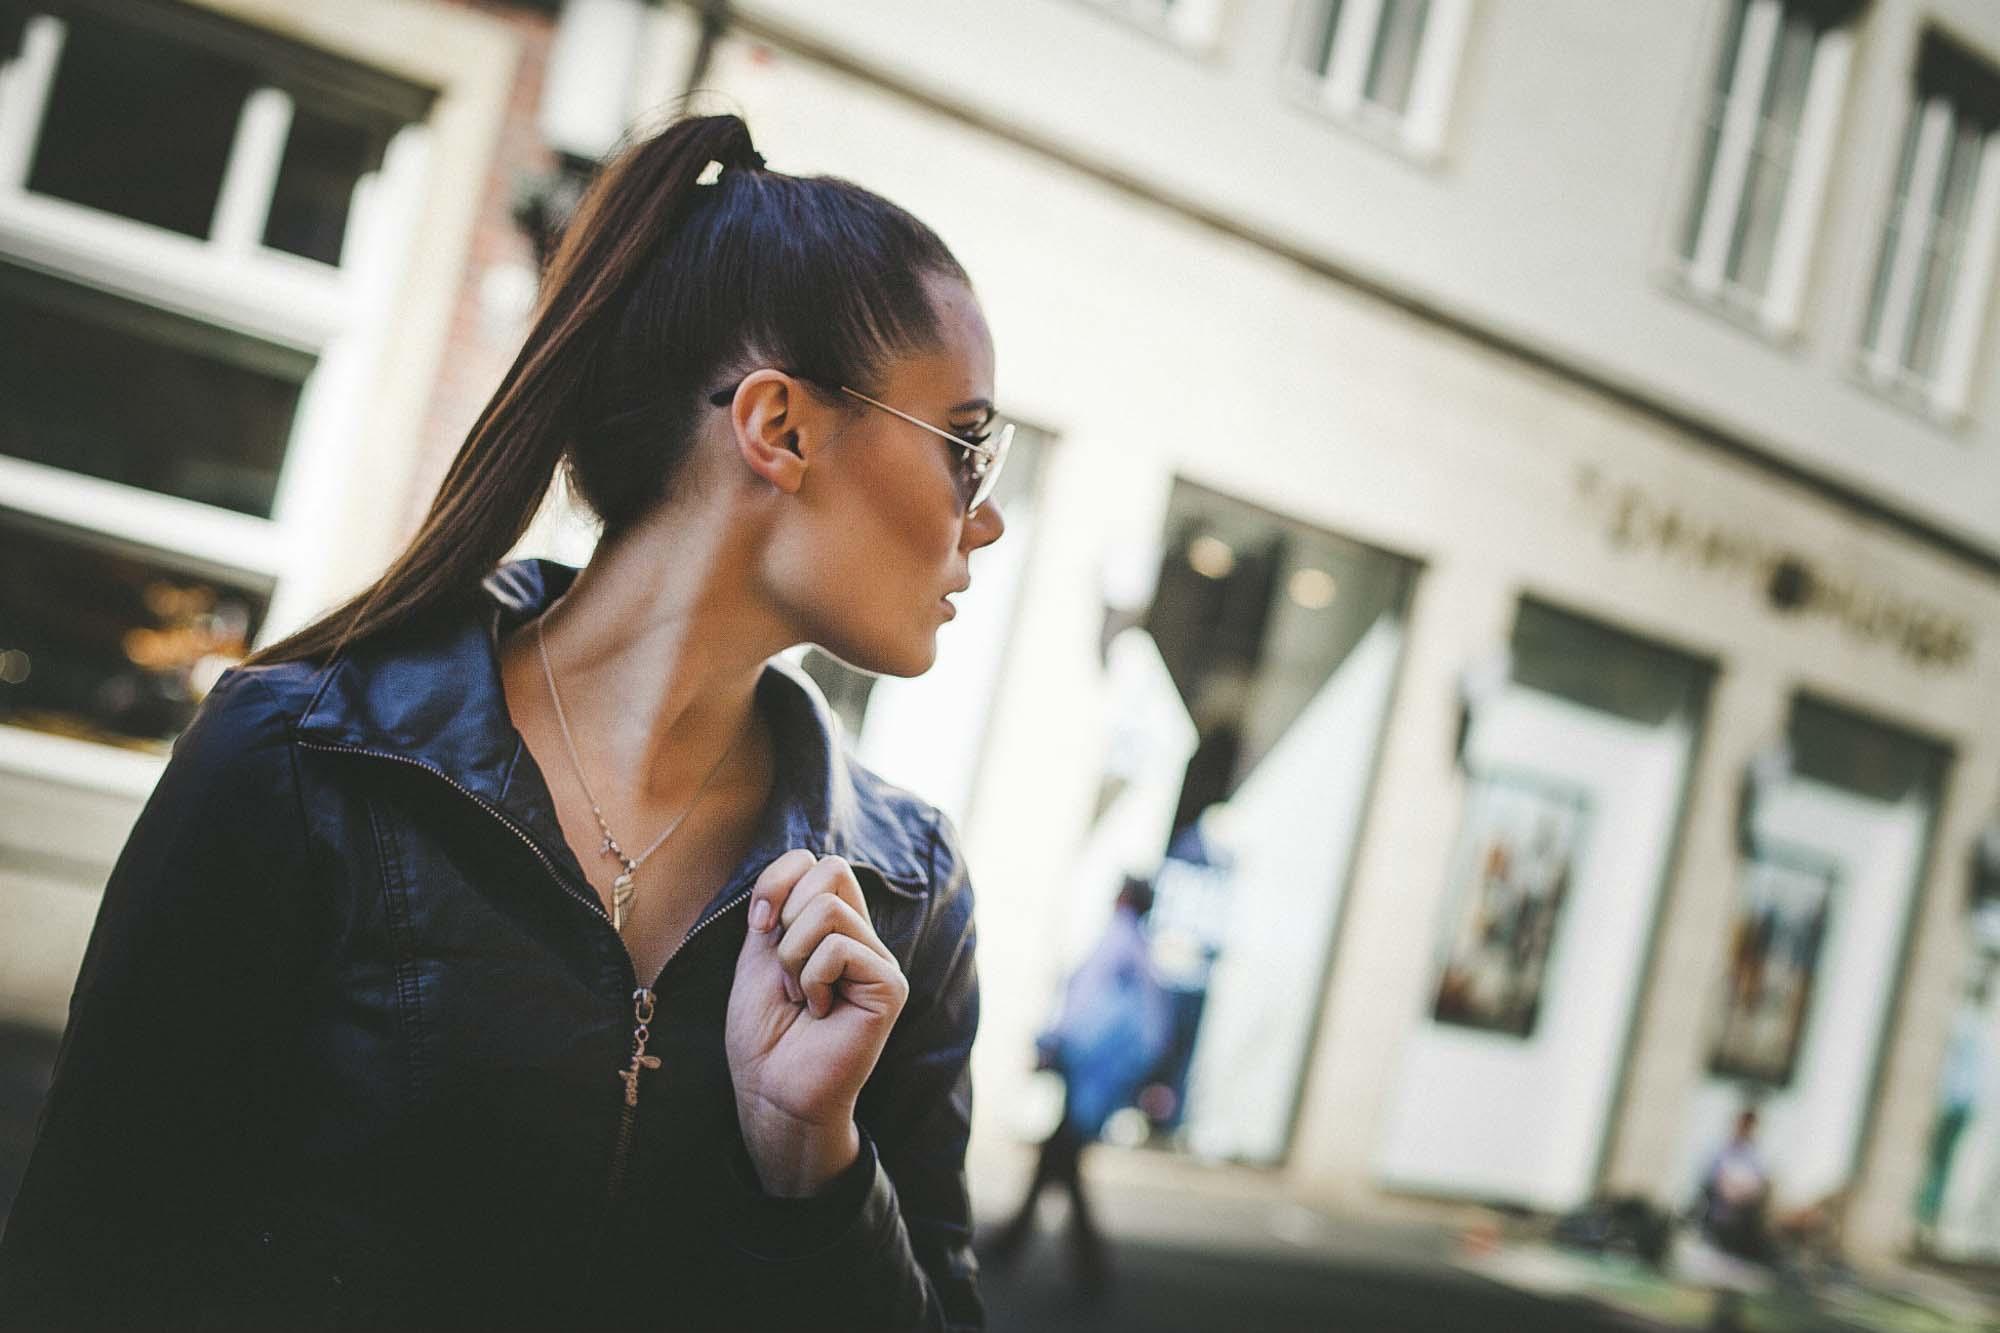 Fotograf Köpenick Portraits von Laura Kindt in der Stadt